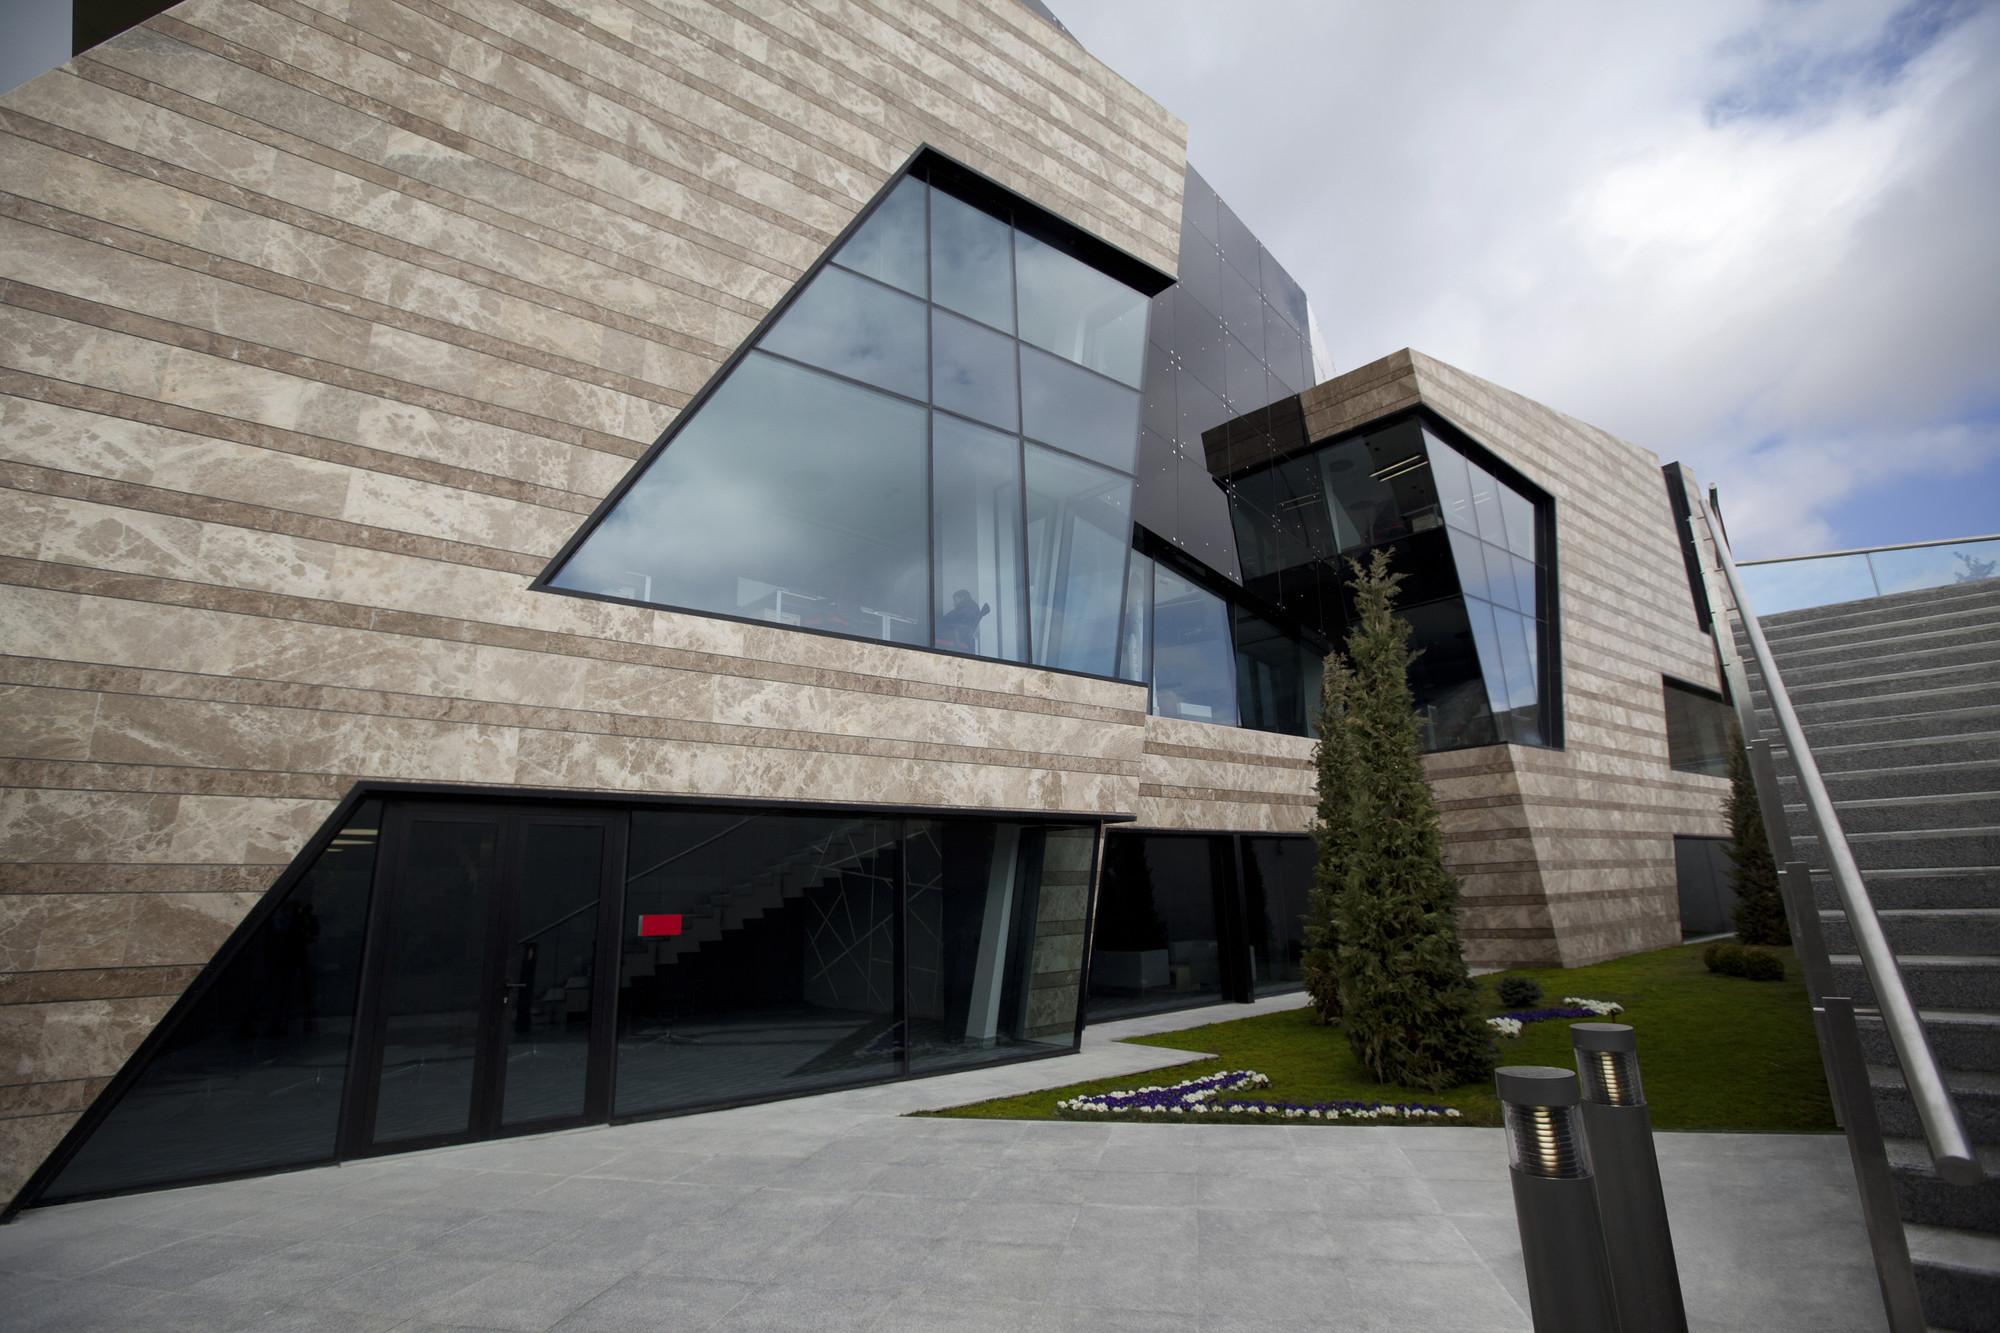 Azercosmos / Nariman Architecture